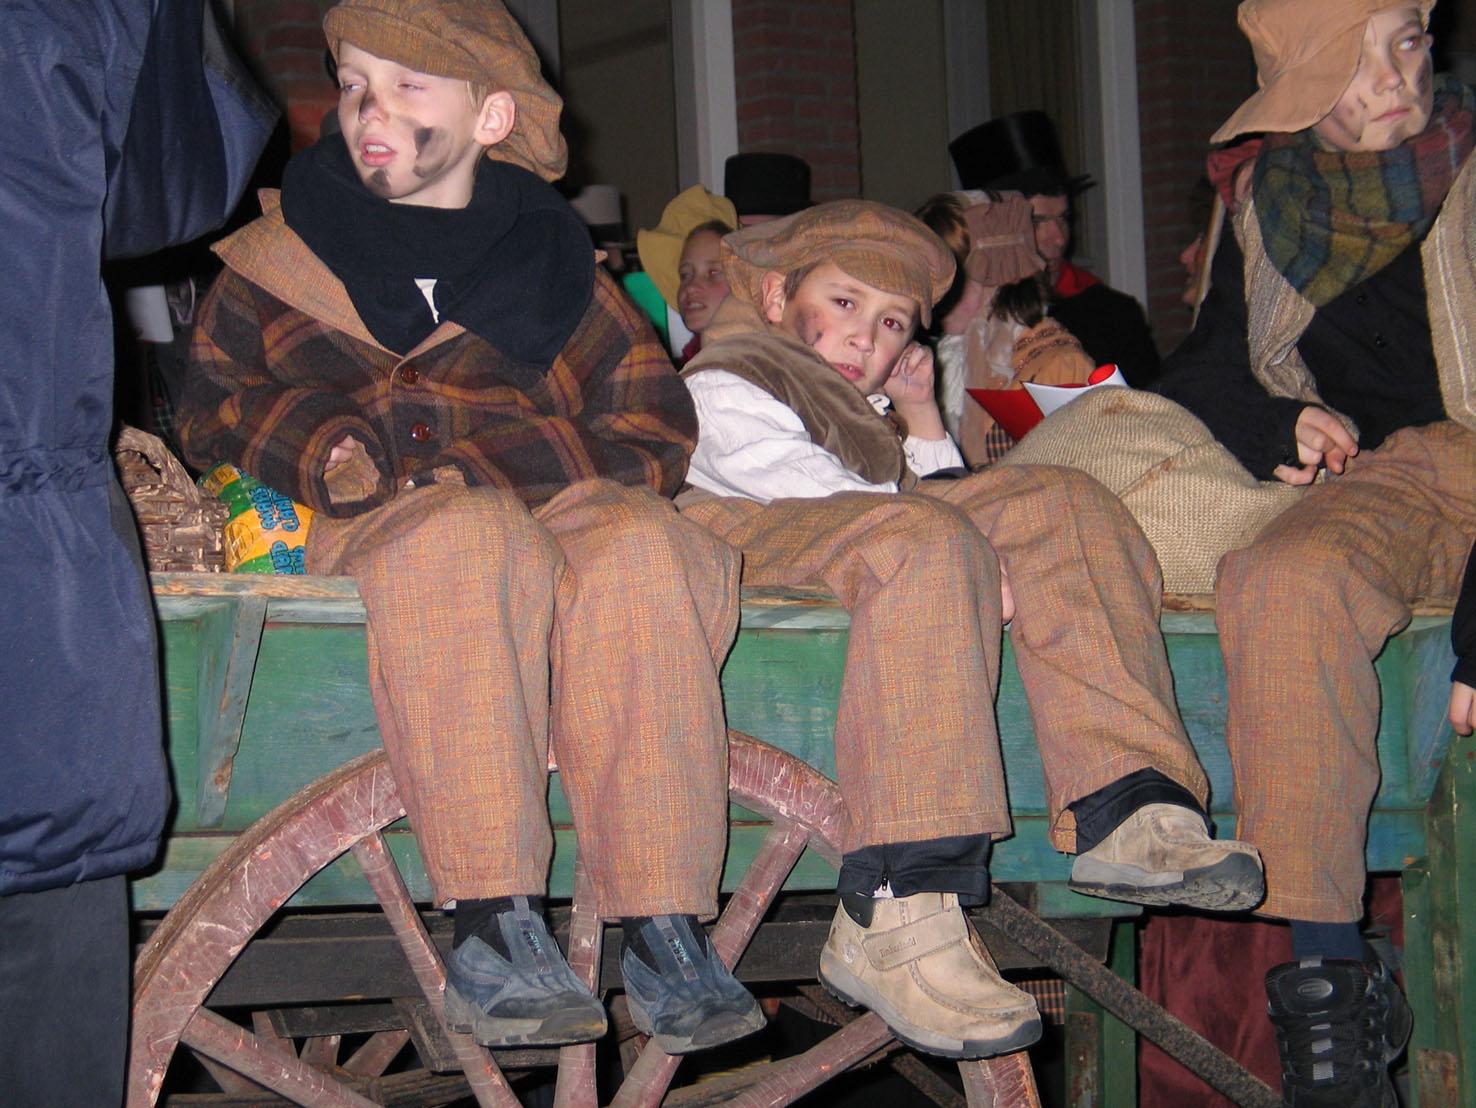 082 - Kerstmarkt Helmond 2003.jpg